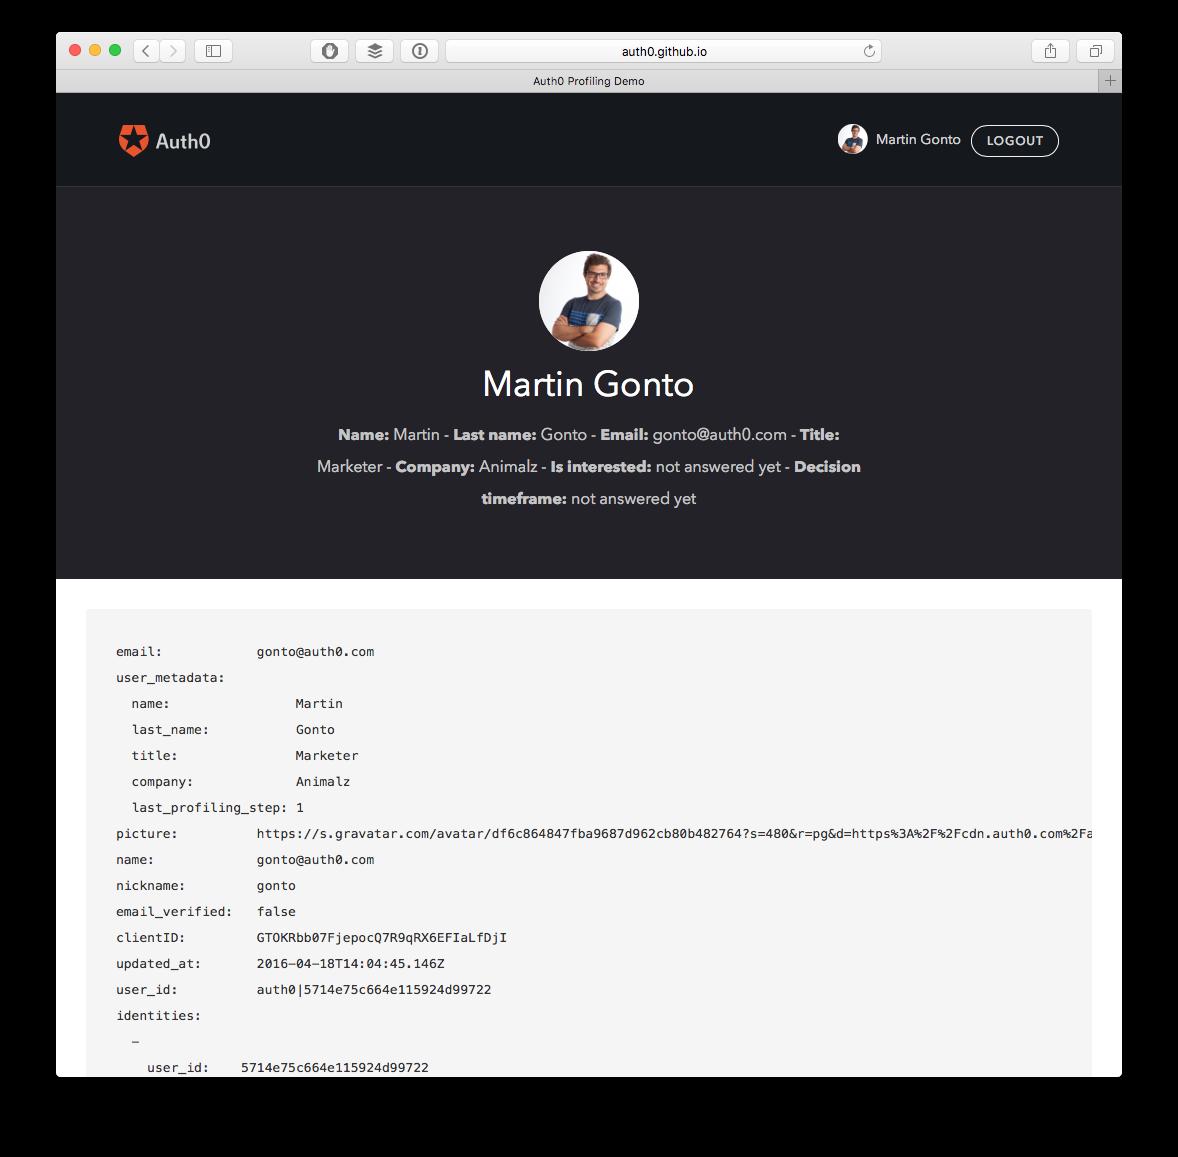 progressive profiling user-metadata